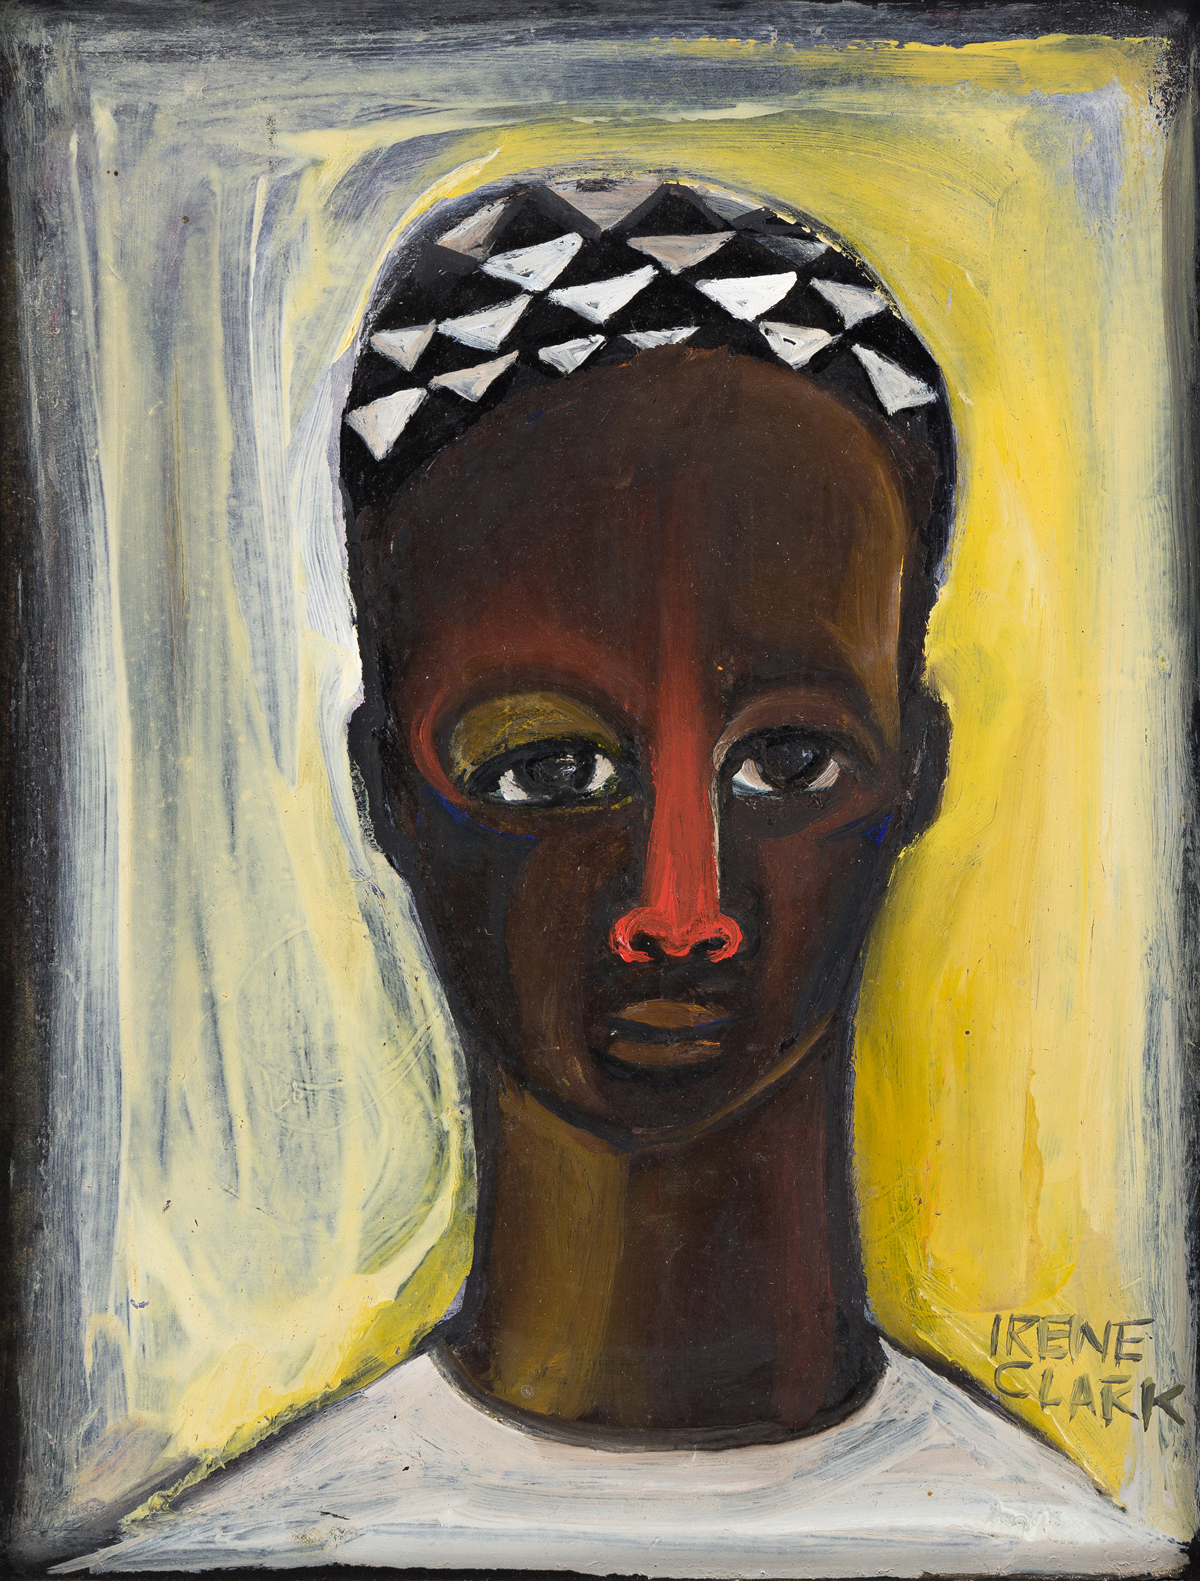 IRENE V. CLARK (1927 - 1984) Untitled (Head of an African Man).